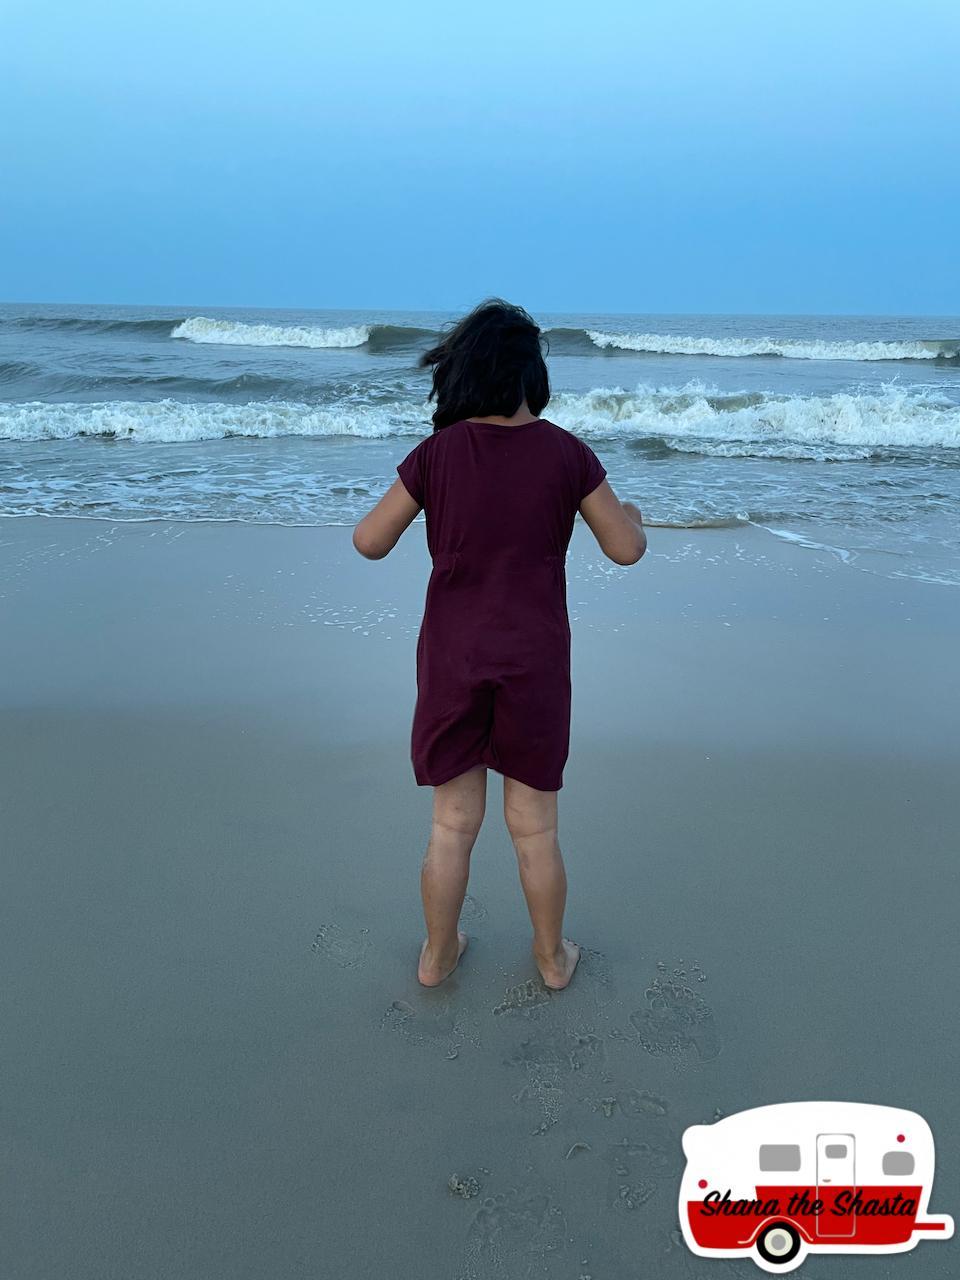 Waves-on-Sand-Beach-at-Assateague